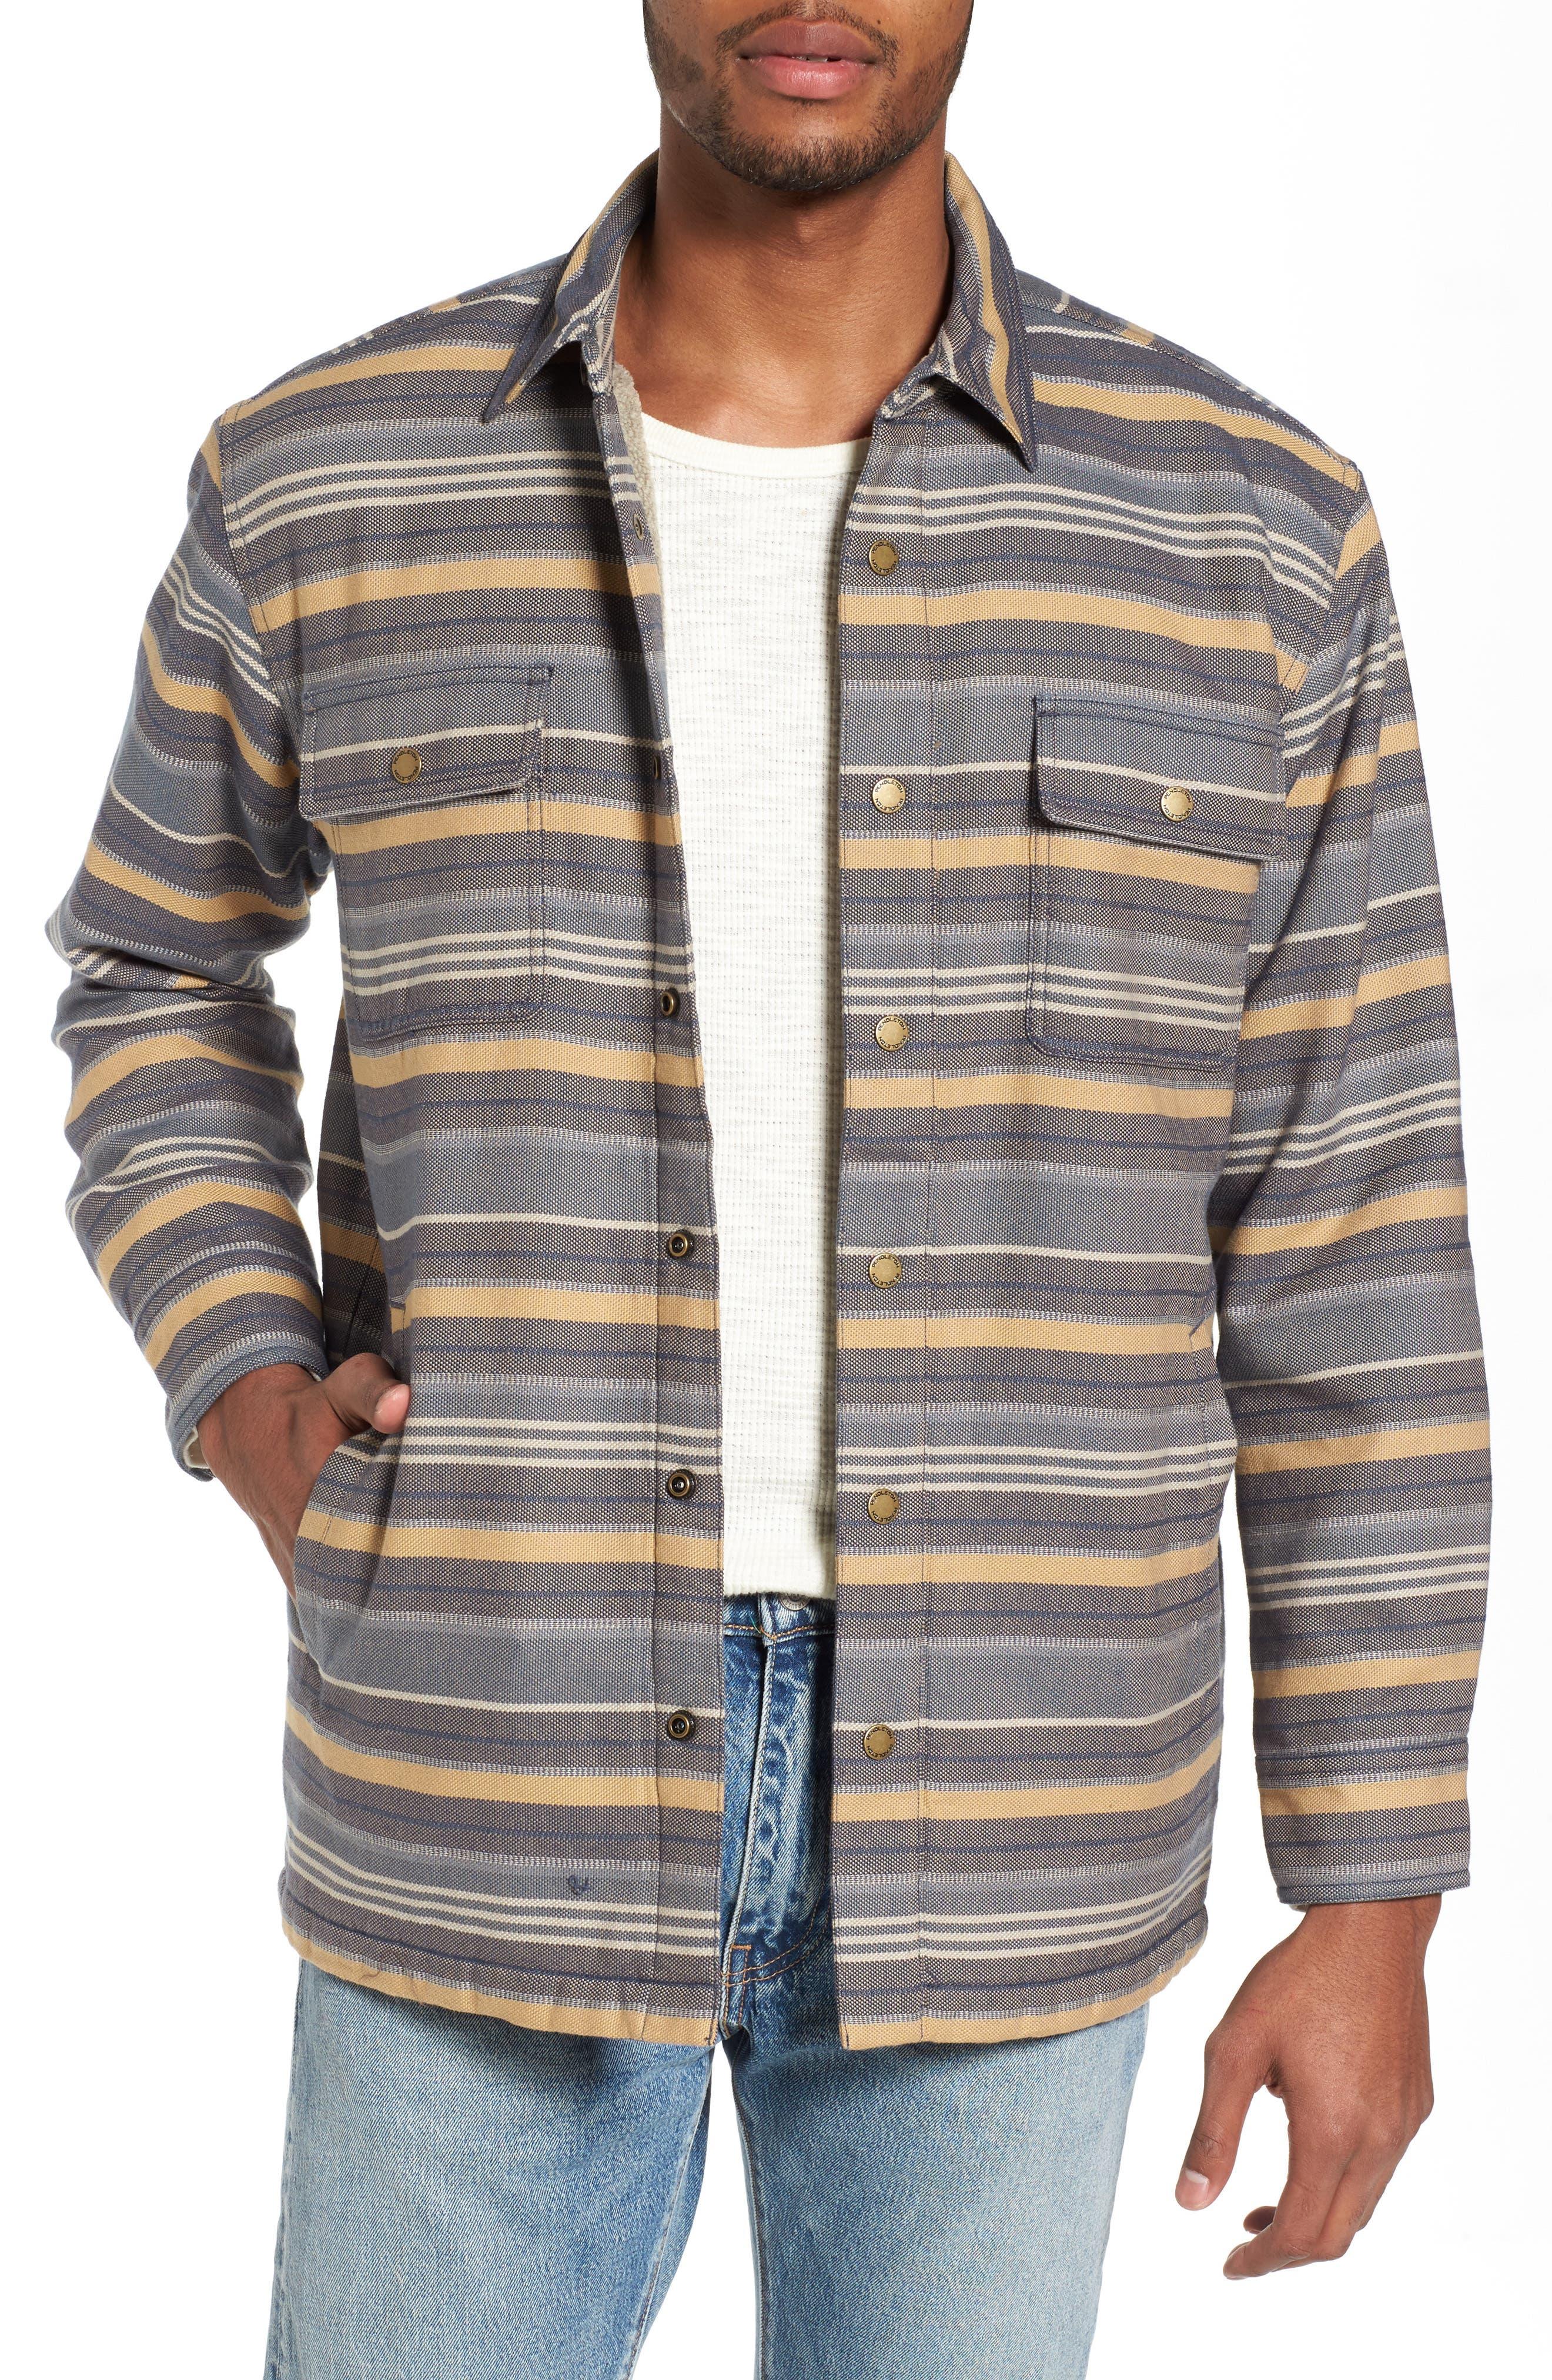 Main Image - Pendleton Fleece Lined Shirt Jacket